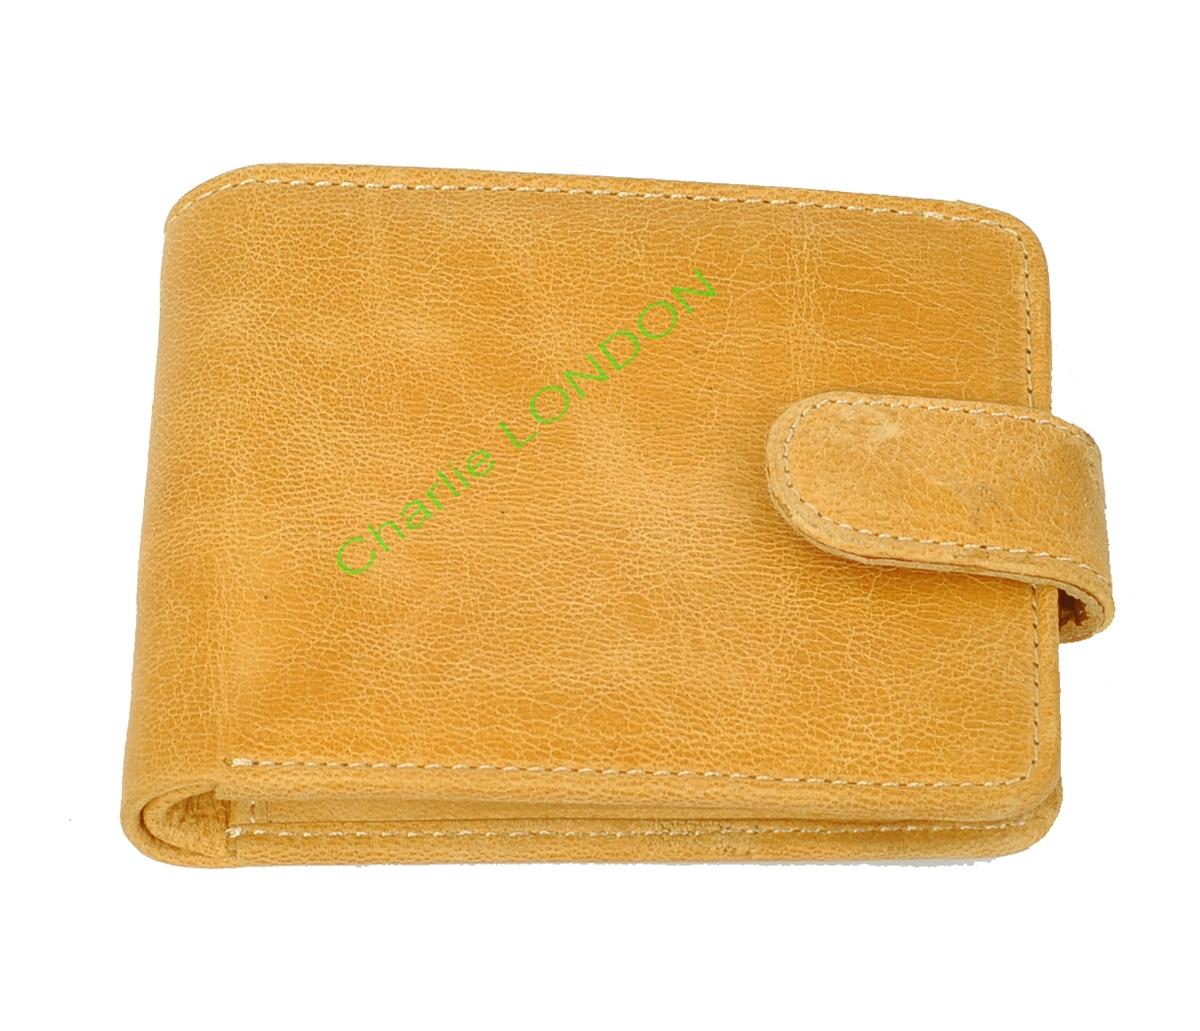 Glazed Tan Genuine Leather Wallet